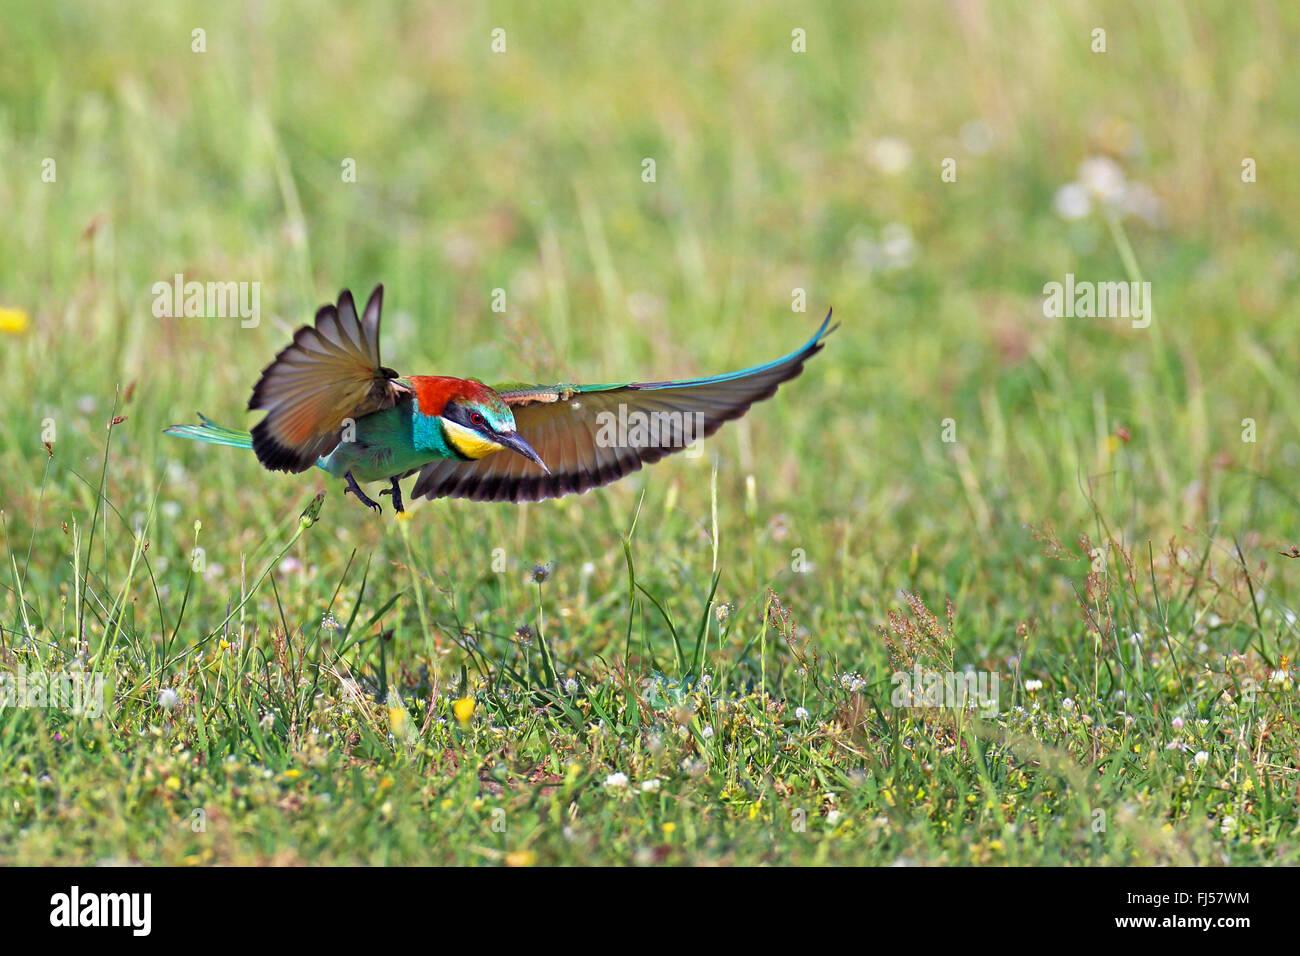 Abeja europea eater (Merops apiaster), volando, aterrizando en el pasto, Grecia, Evrosdelta Foto de stock